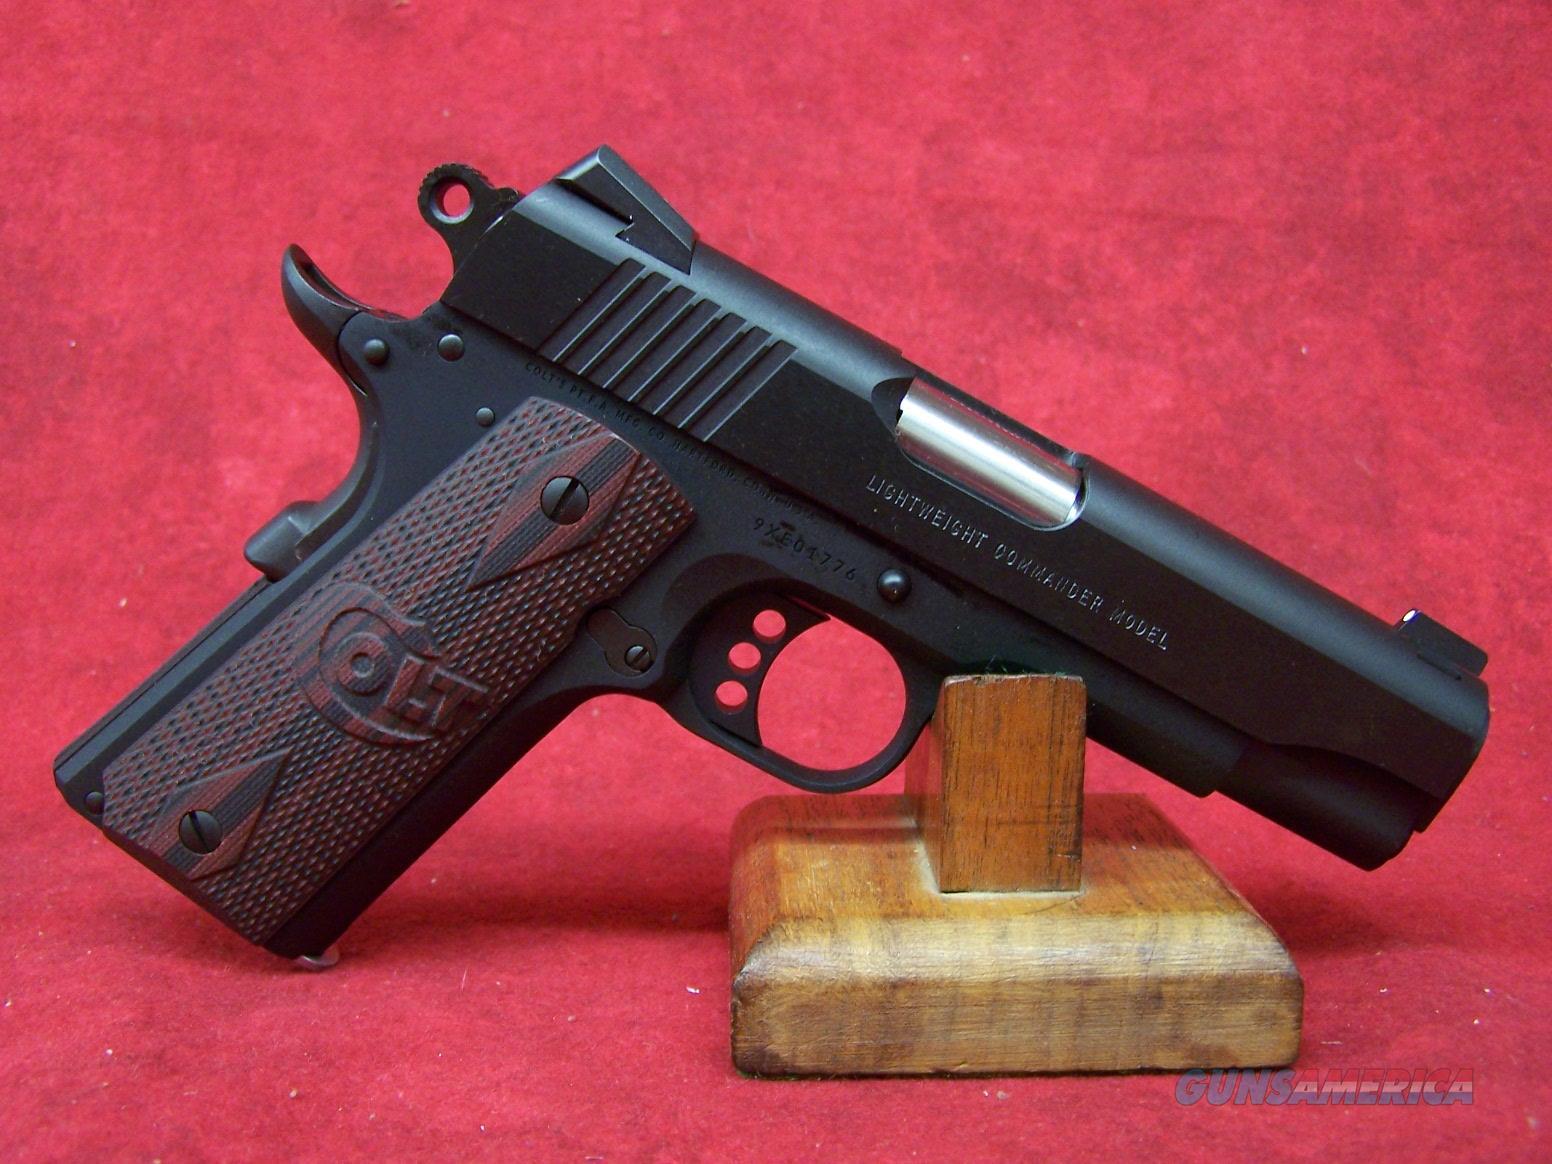 Colt Lightweight Commander 9mm 4.25 Inch Barrel Blue Finish Carbon Steel Slide (04842XE)  Guns > Pistols > Colt Automatic Pistols (1911 & Var)